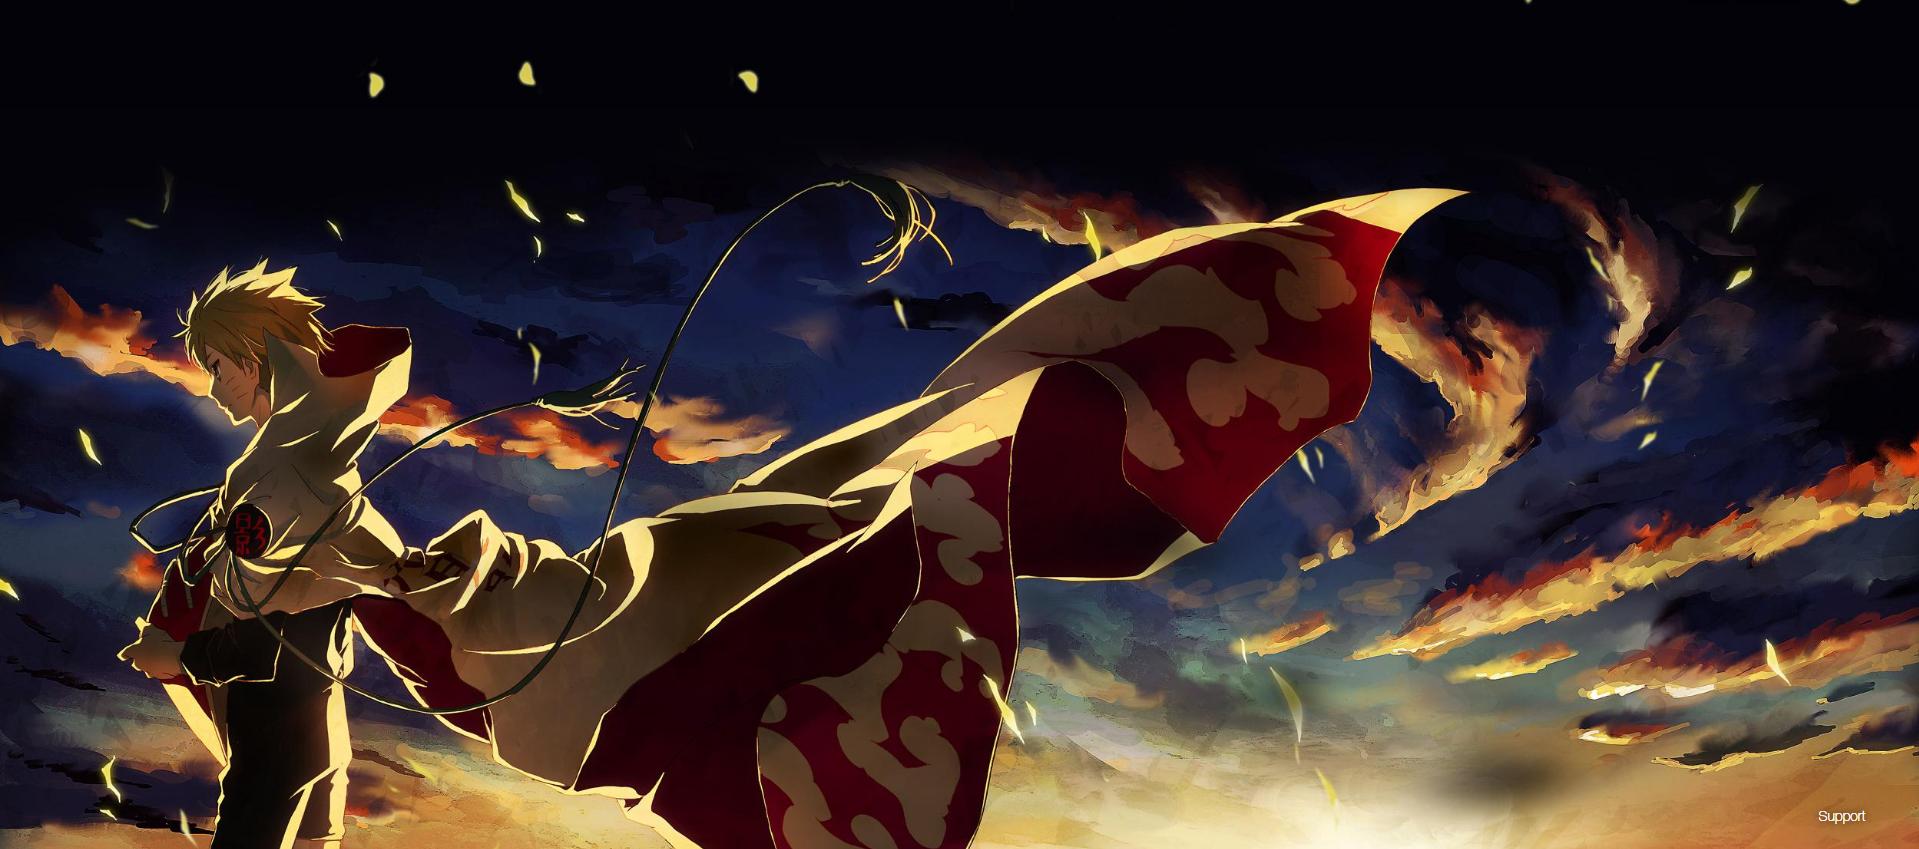 Naruto Naruto Shippuden Cool Anime Wallpapers Anime Backgrounds Wallpapers Cool Anime Backgrounds